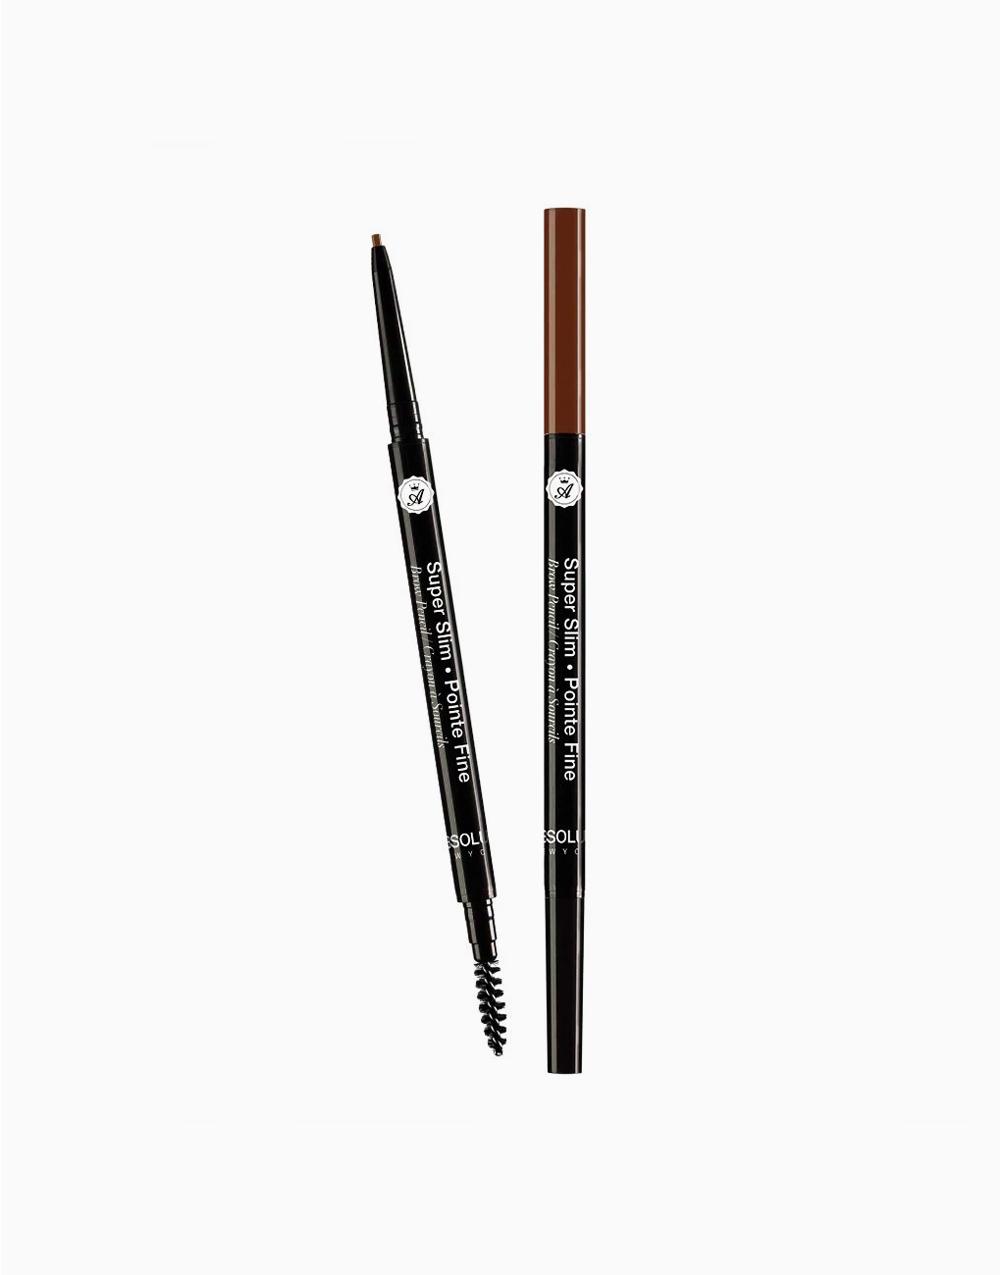 Super Slim Eye Brow Pencil by Absolute New York | Pecan